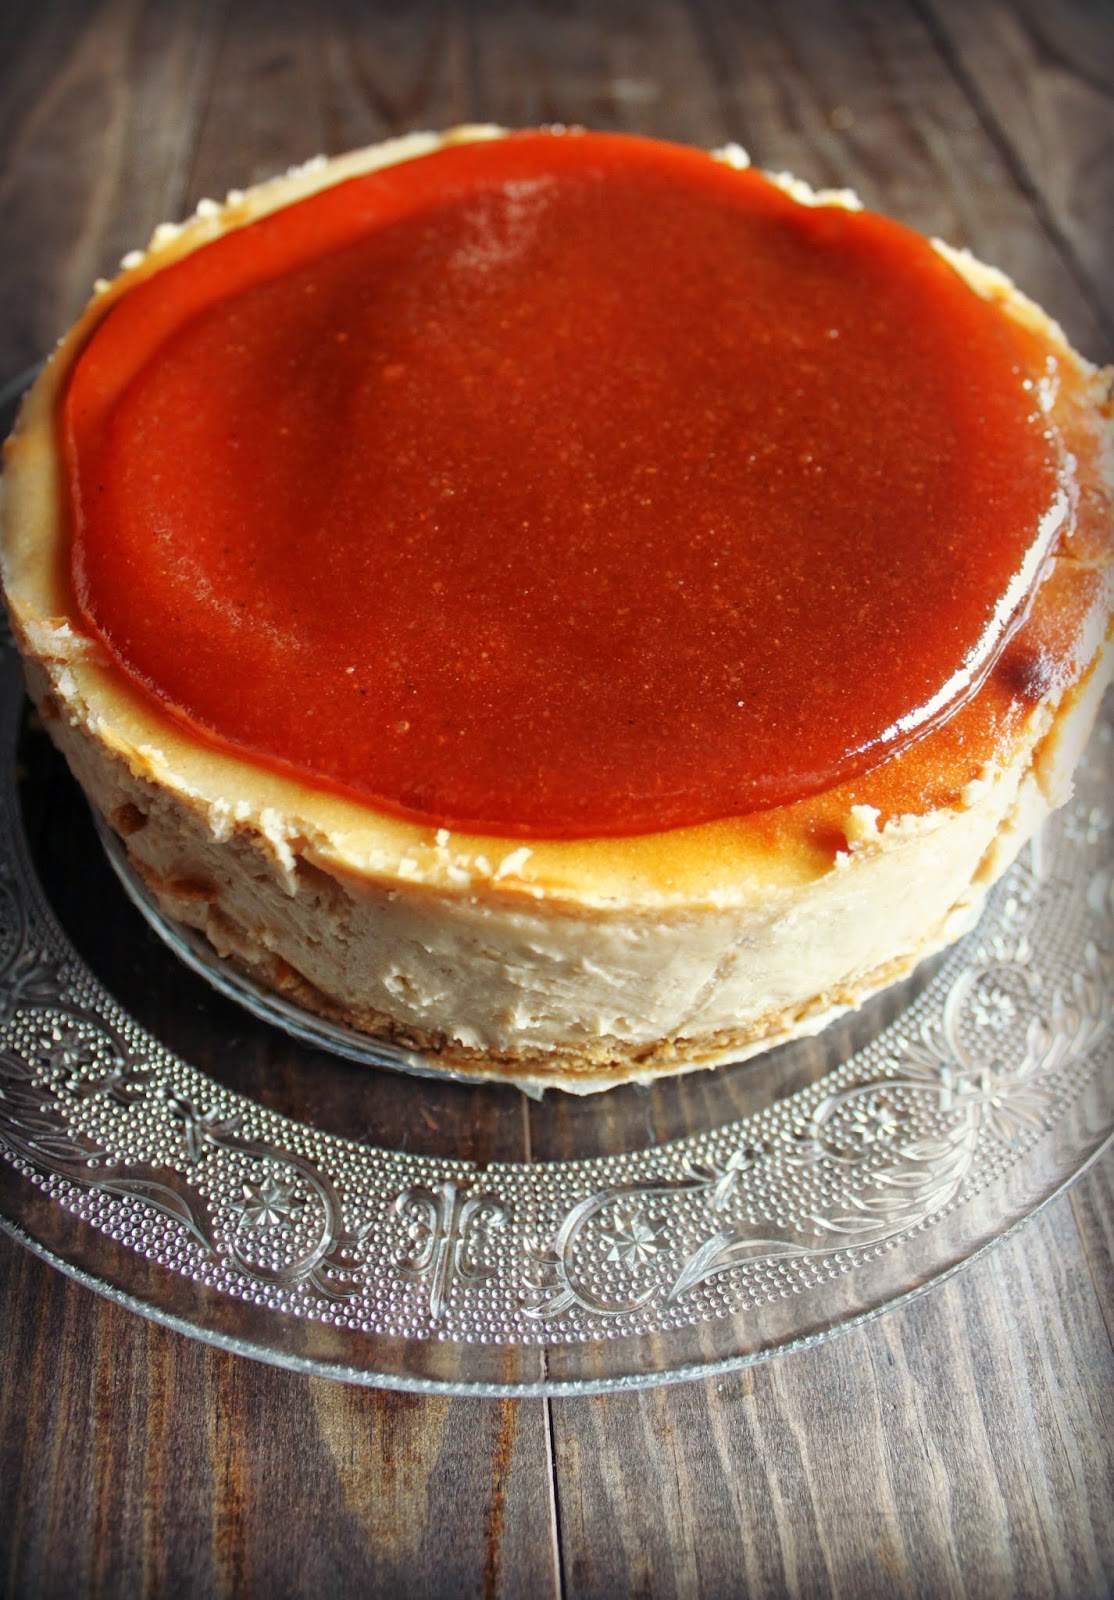 cheesecake tarta de queso cacahuete membrllo